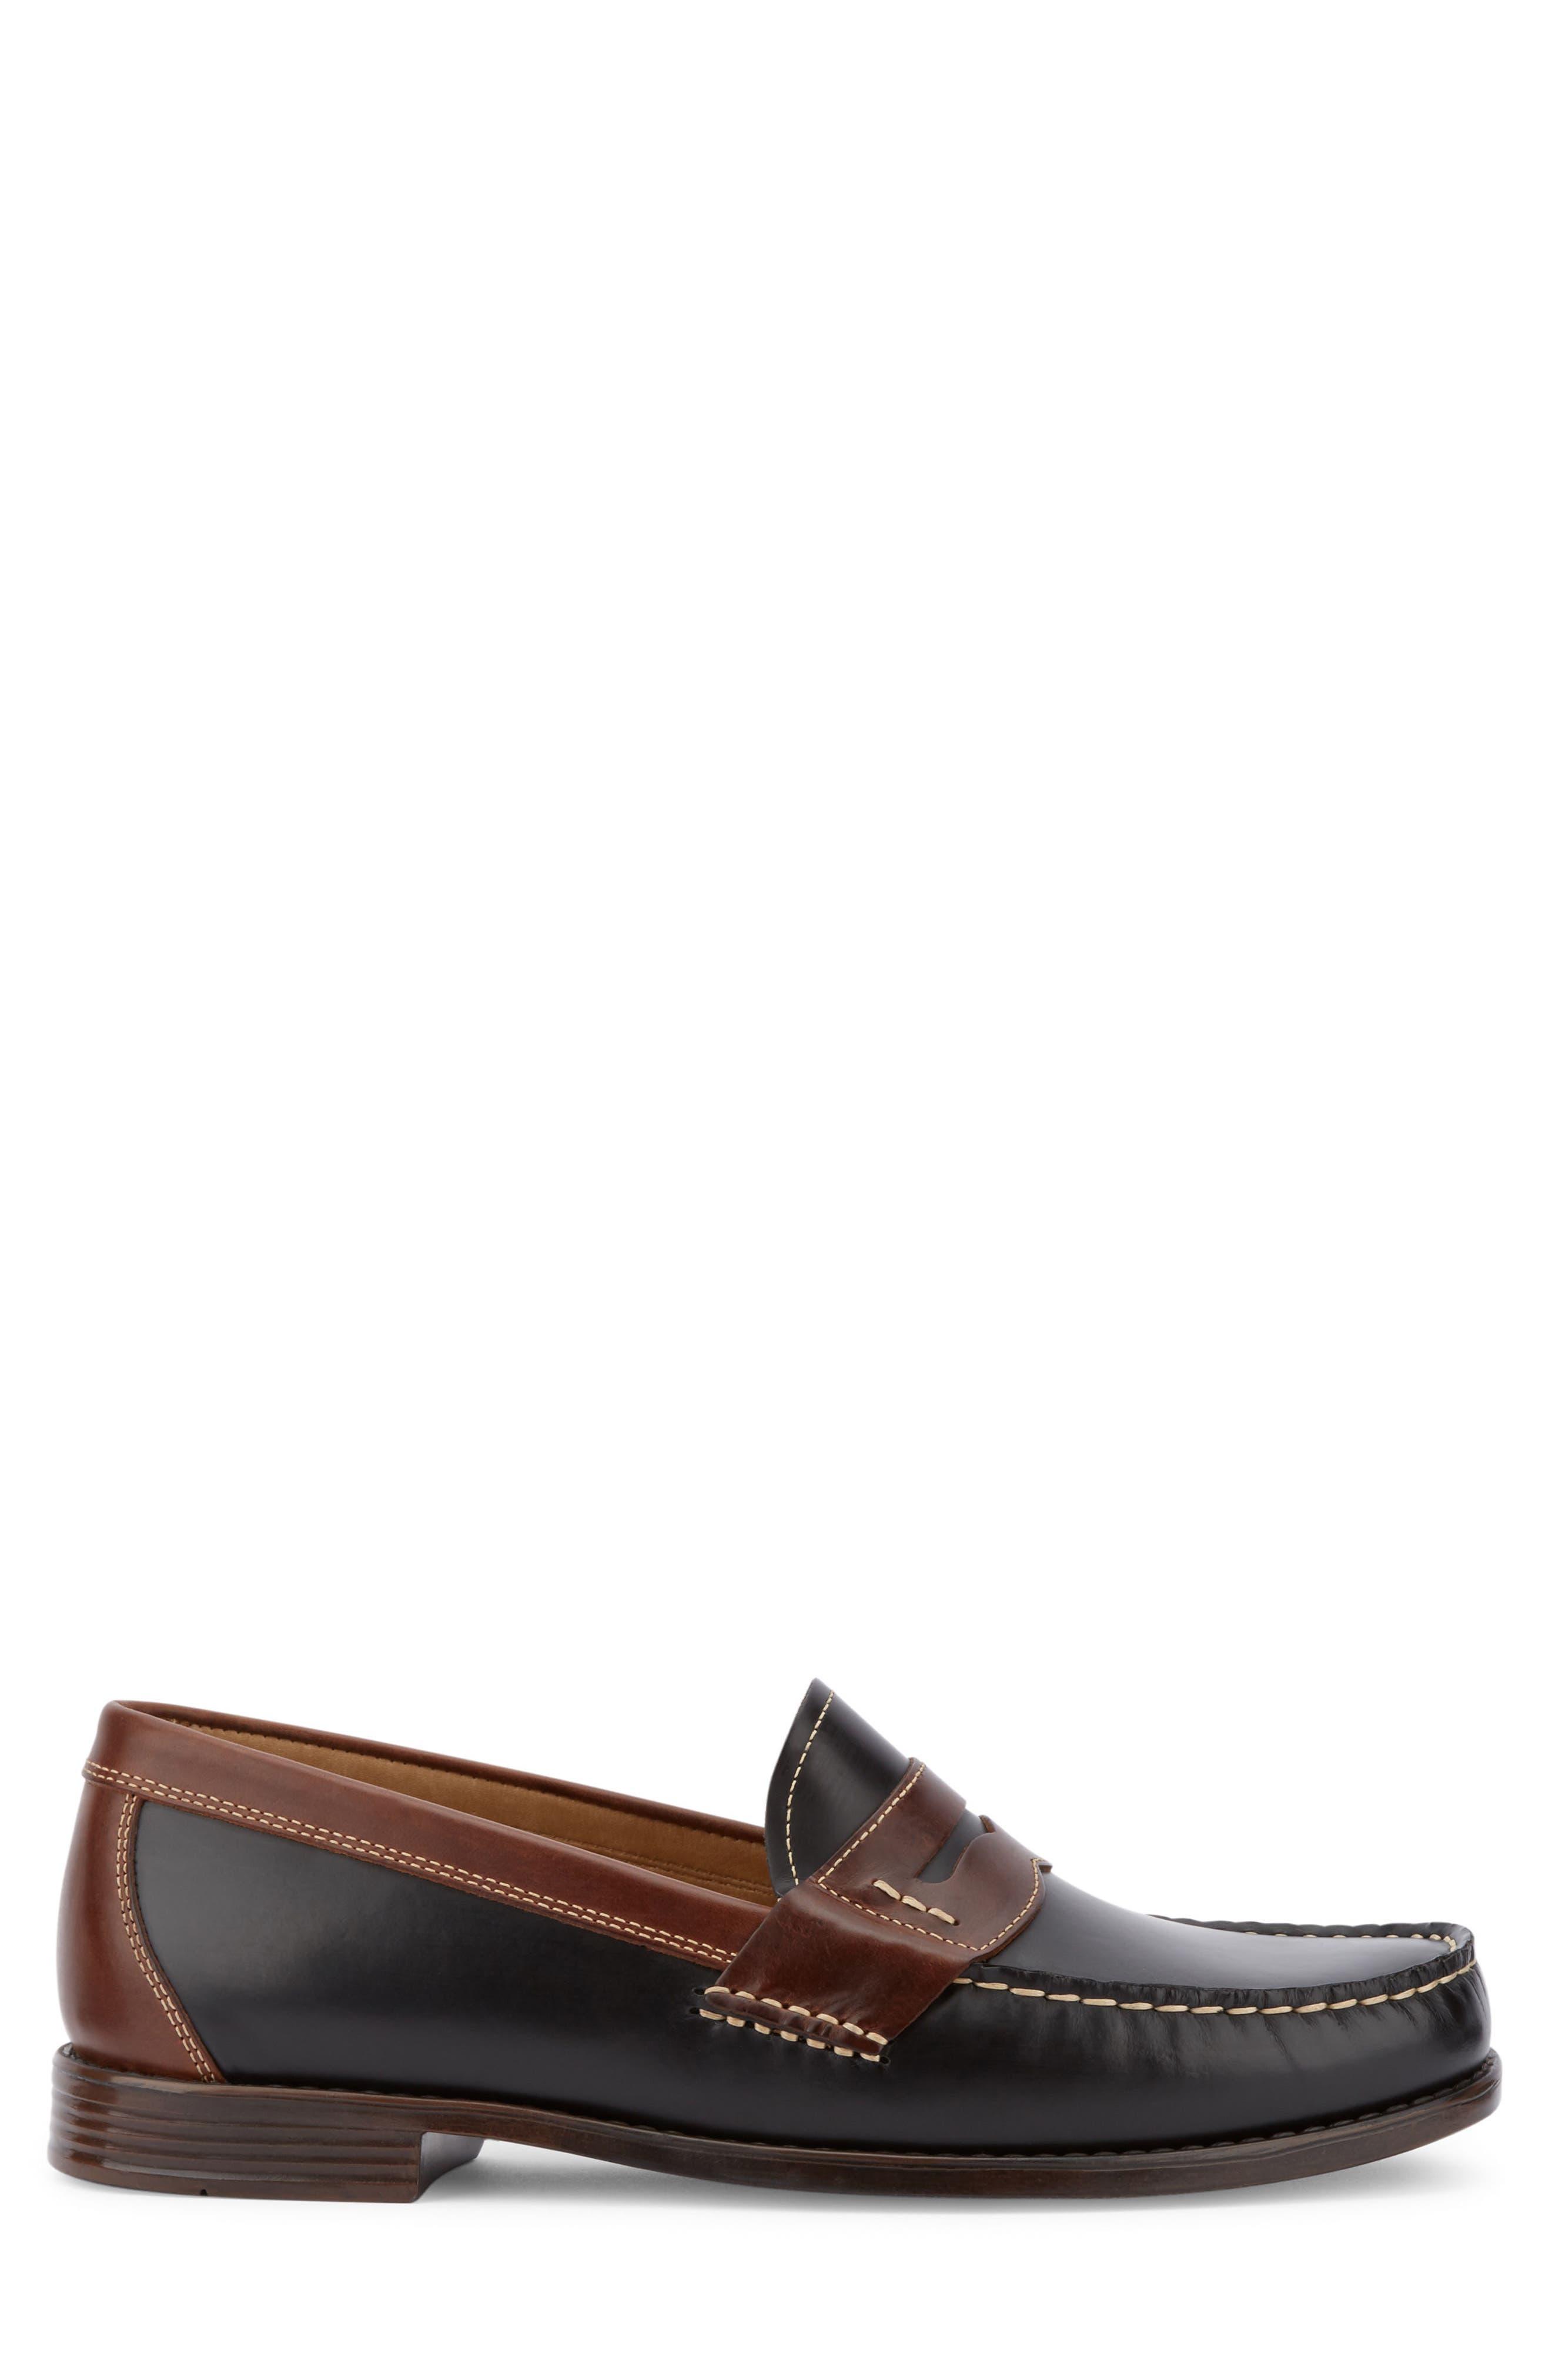 Wagner Penny Loafer,                             Alternate thumbnail 3, color,                             Black/ Dark Brown Leather